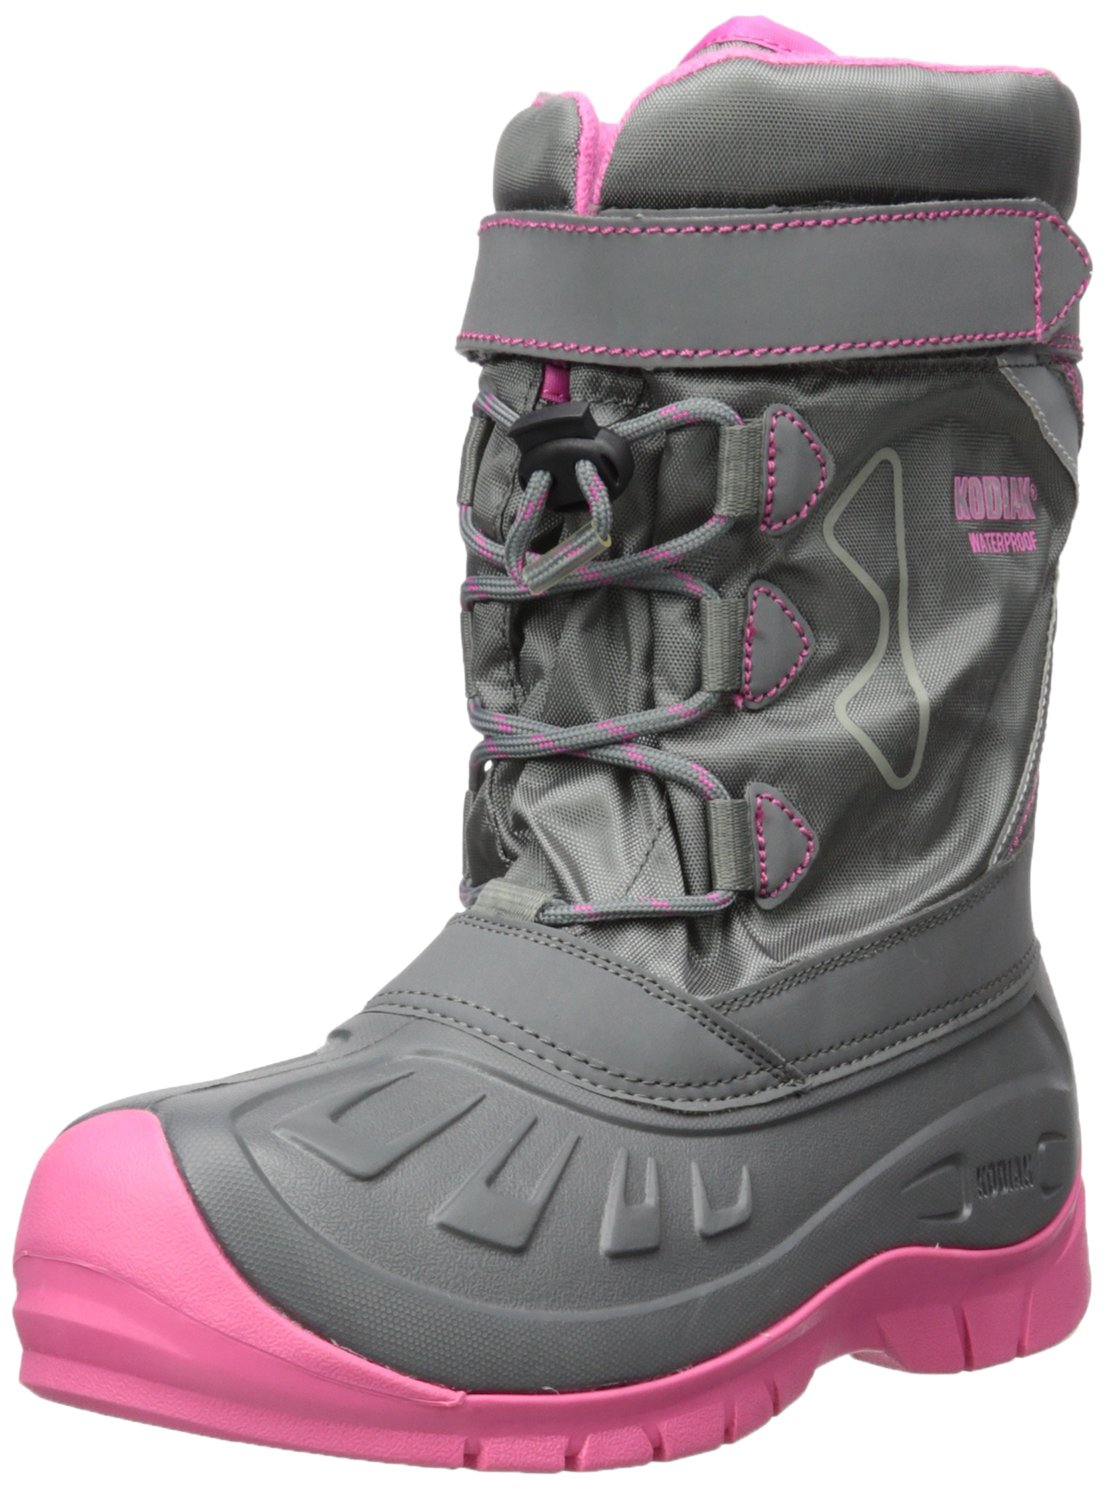 Kodiak Girls' Gracie Snow Boot, Grey/Cotton Candy Pink, 3 M US Big Kid